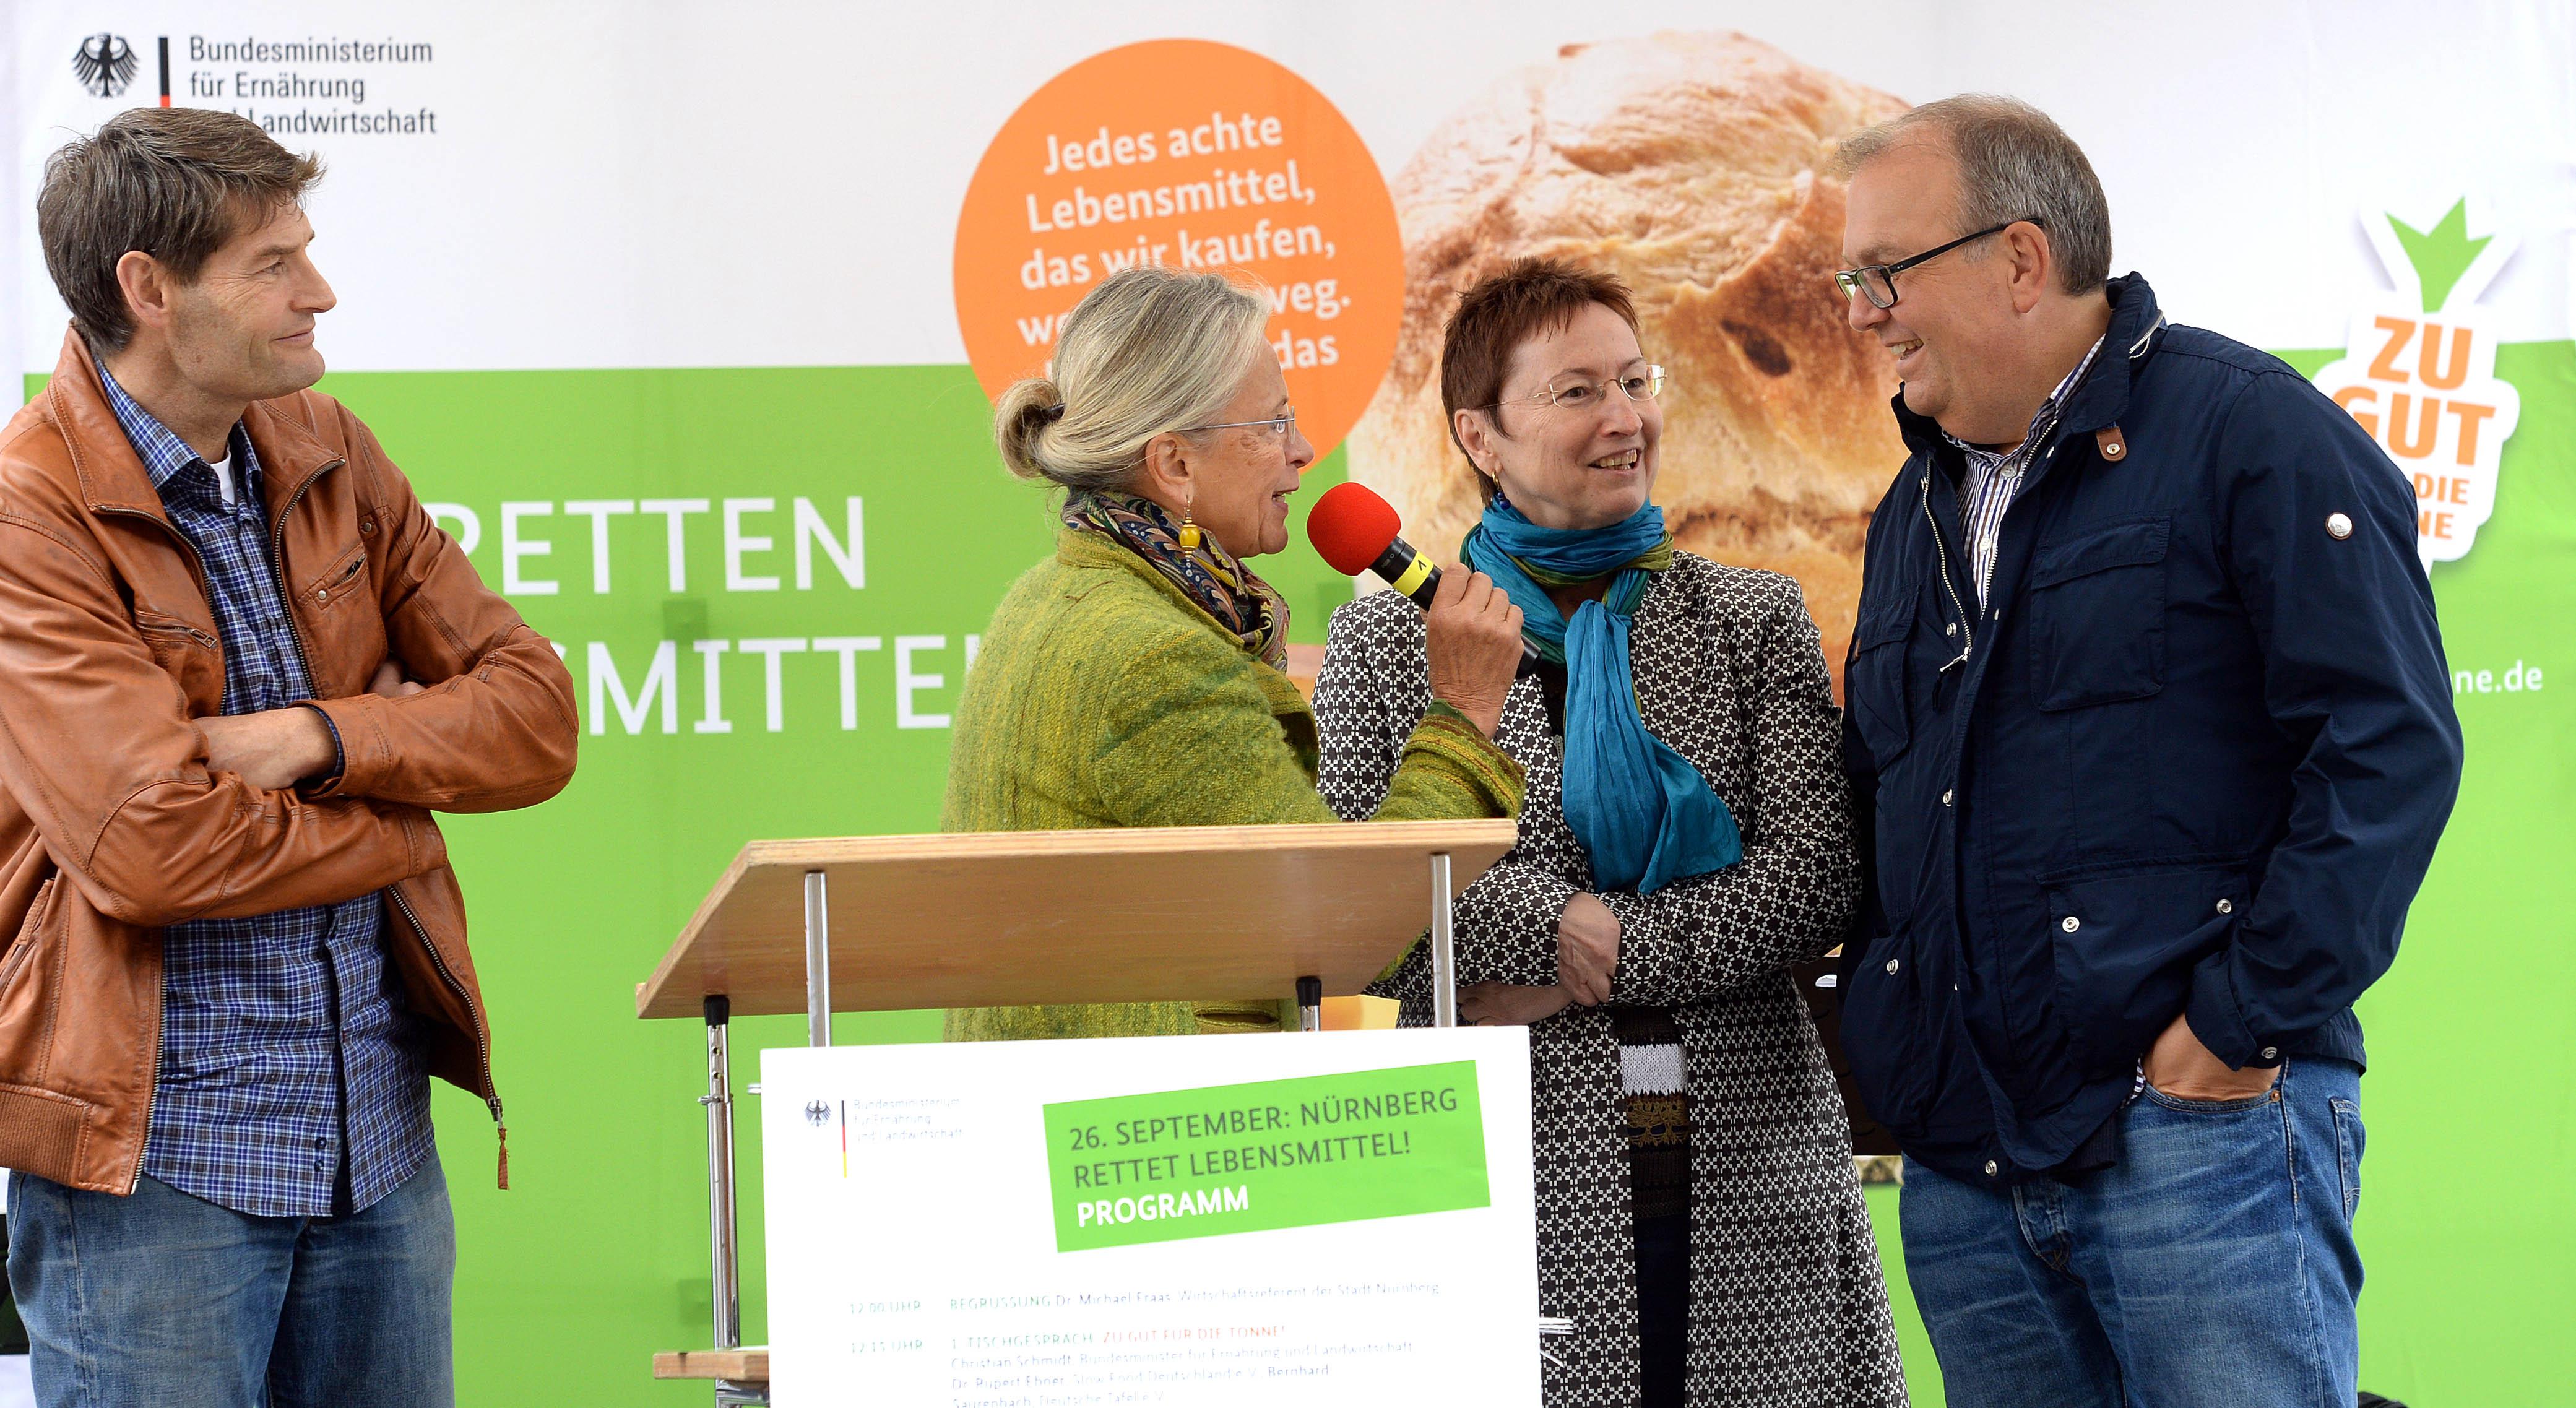 Slow Food, Deutschland, Initiative, Zu gut fŸr die Tonne Aktionstag, NŸrnberg Foto:NŸrnberg, 26.09.2015, Anestis Aslanidis , mobil: 0173 / 58 86 725